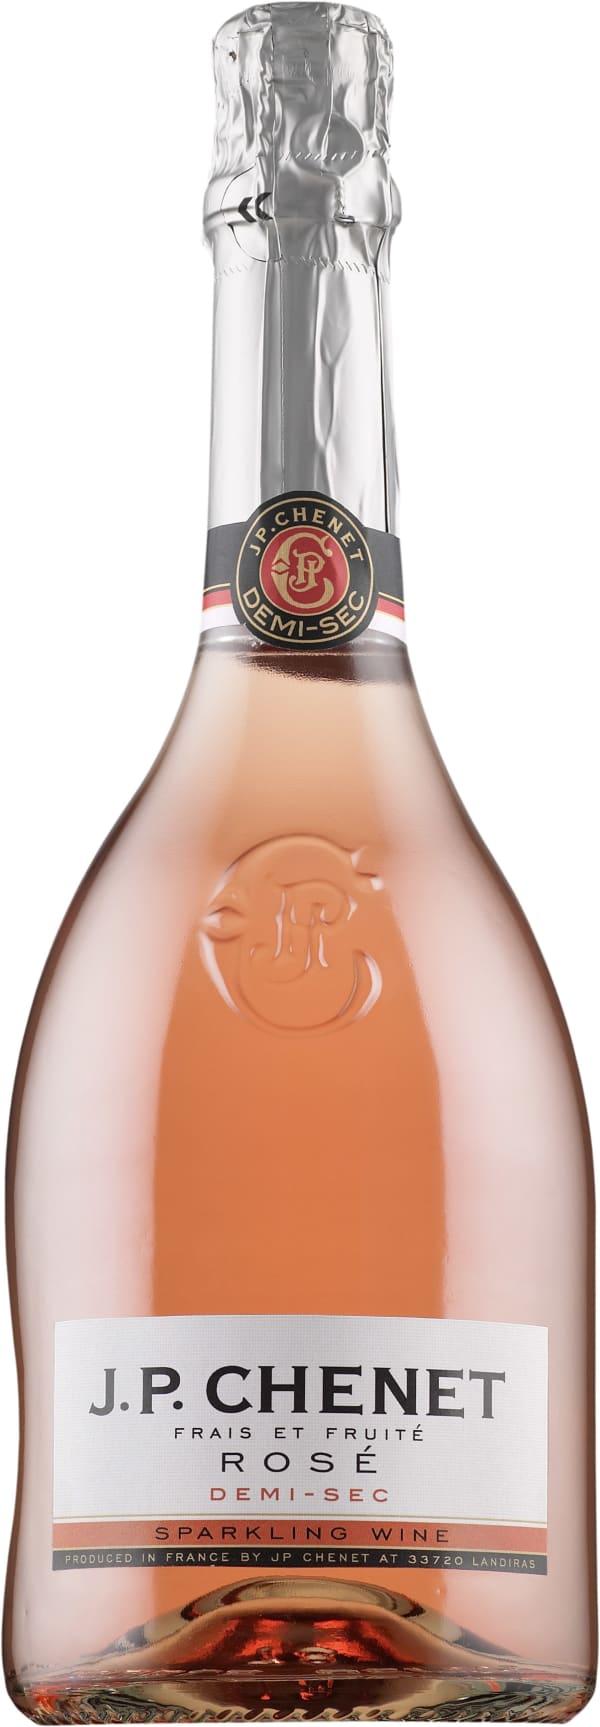 J.P. Chenet Rosé Demi-Sec